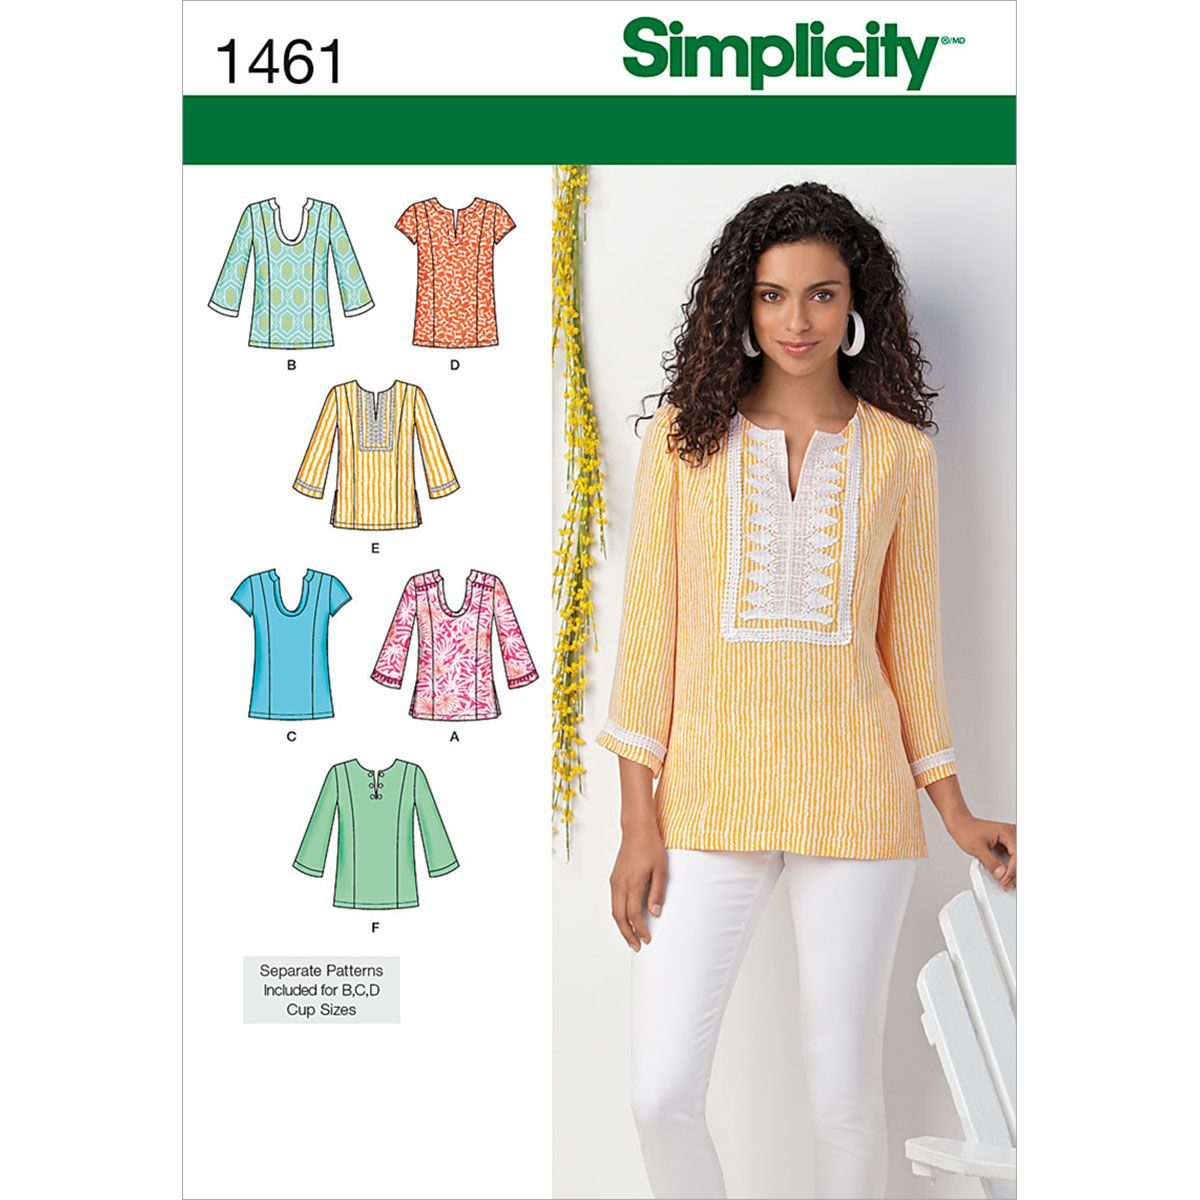 Simplicity Pattern 1461BB 20W - 28W - Misses Tops Vests